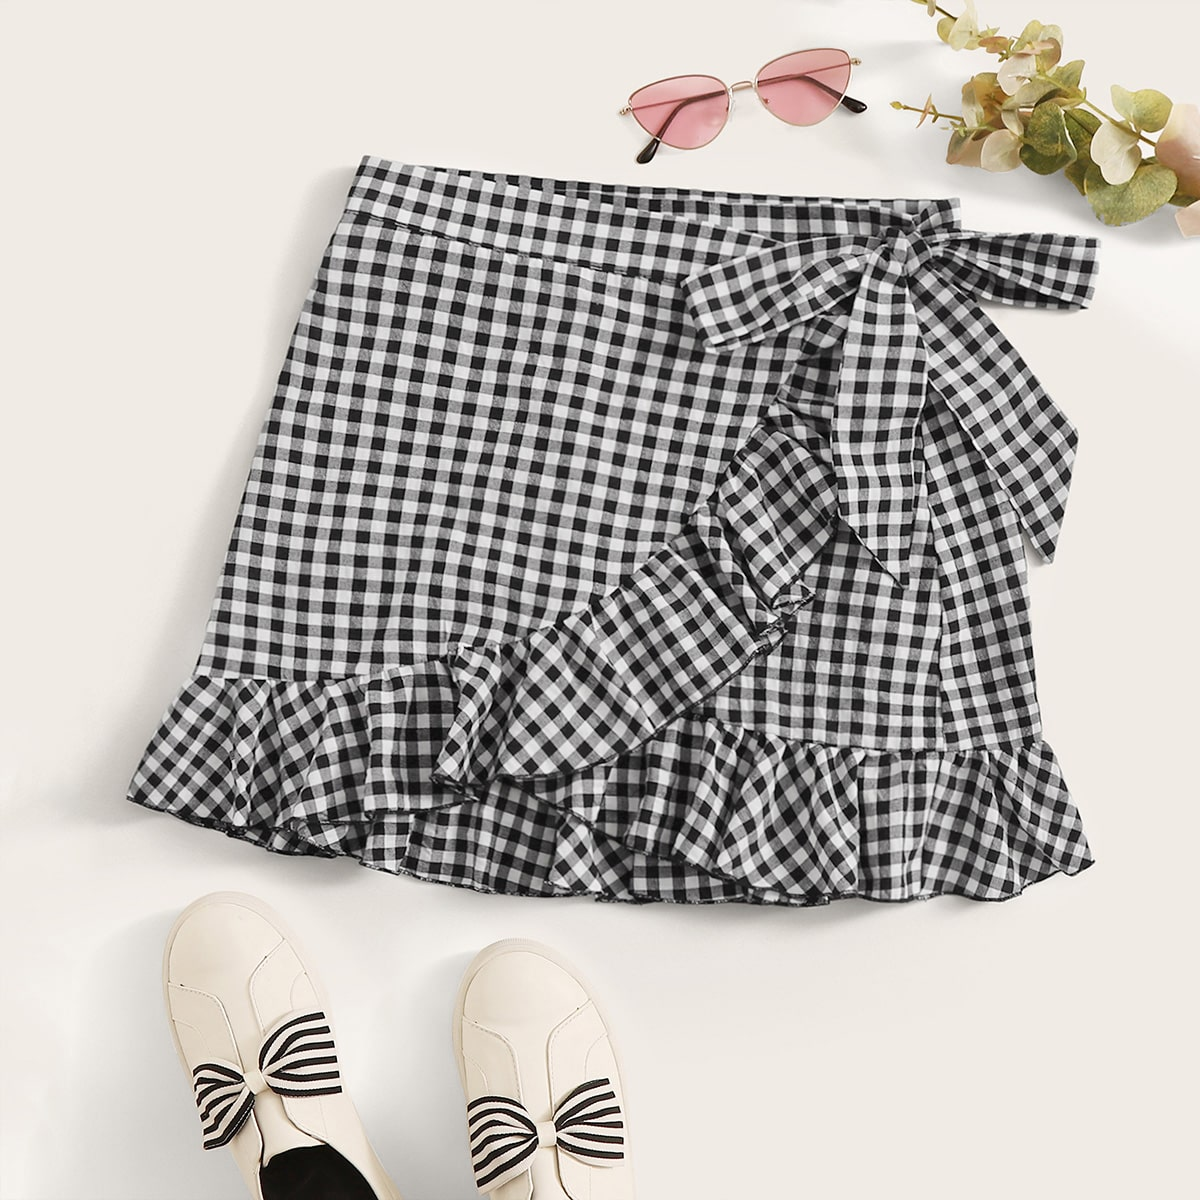 Gingham Ruffled Wrap Mini Skirt